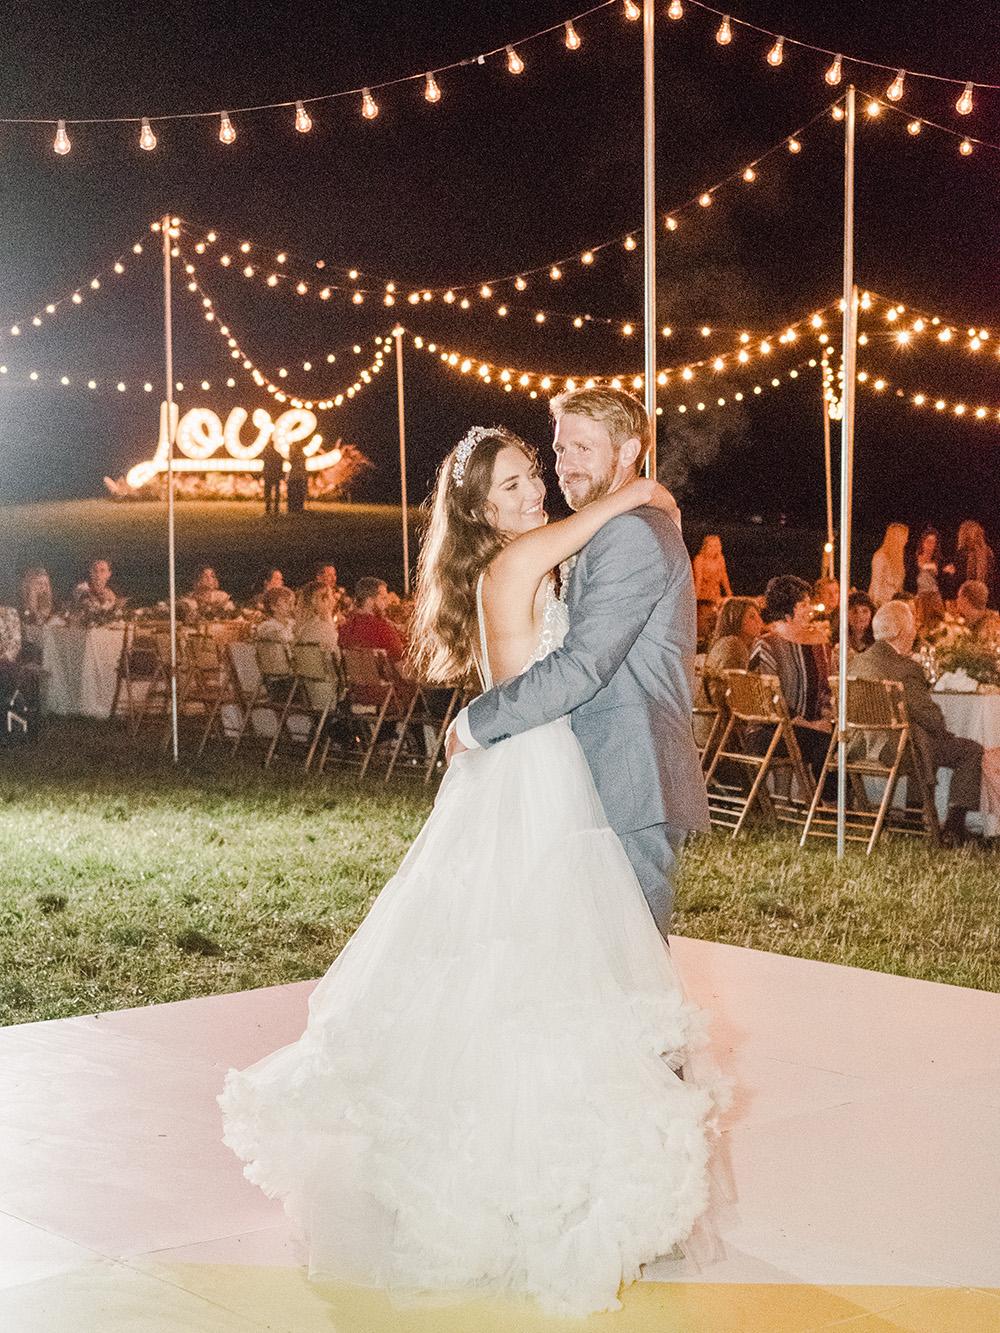 India___Corey___The_Wedding_-653.jpg